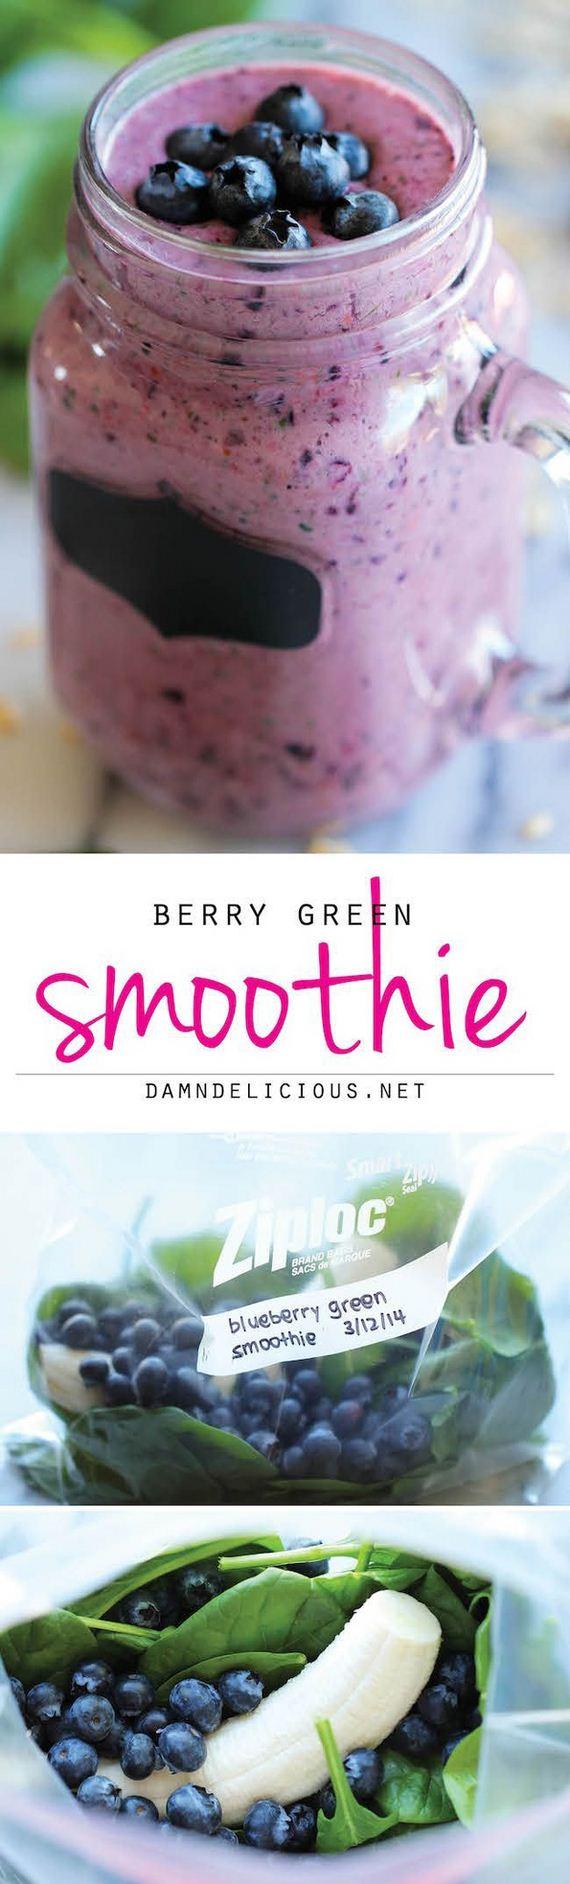 02-healthy_smoothie_recipes